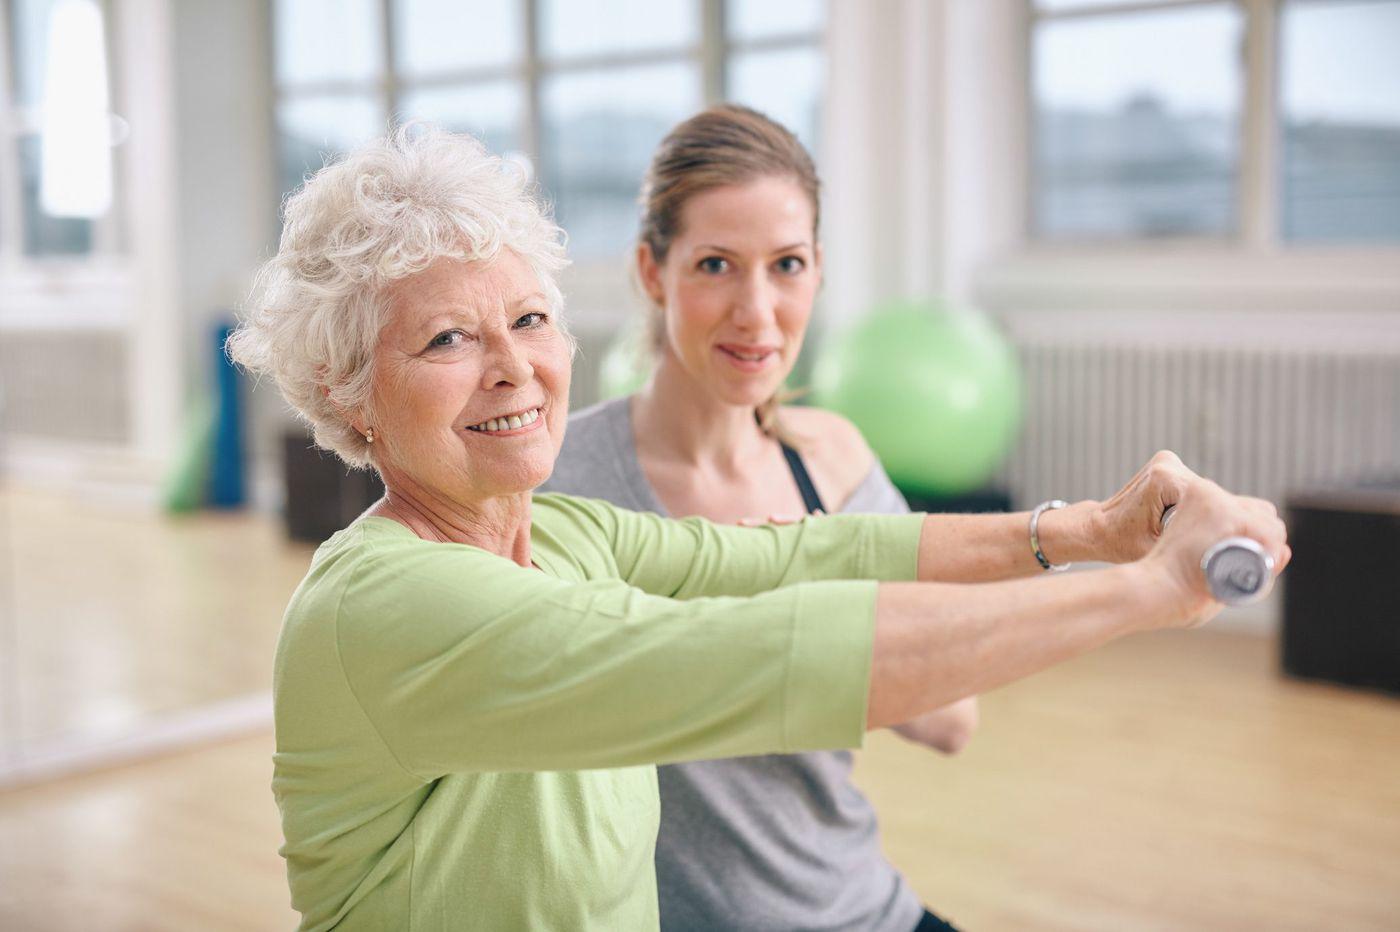 Older women need to pump it up | Kimberly Garrison